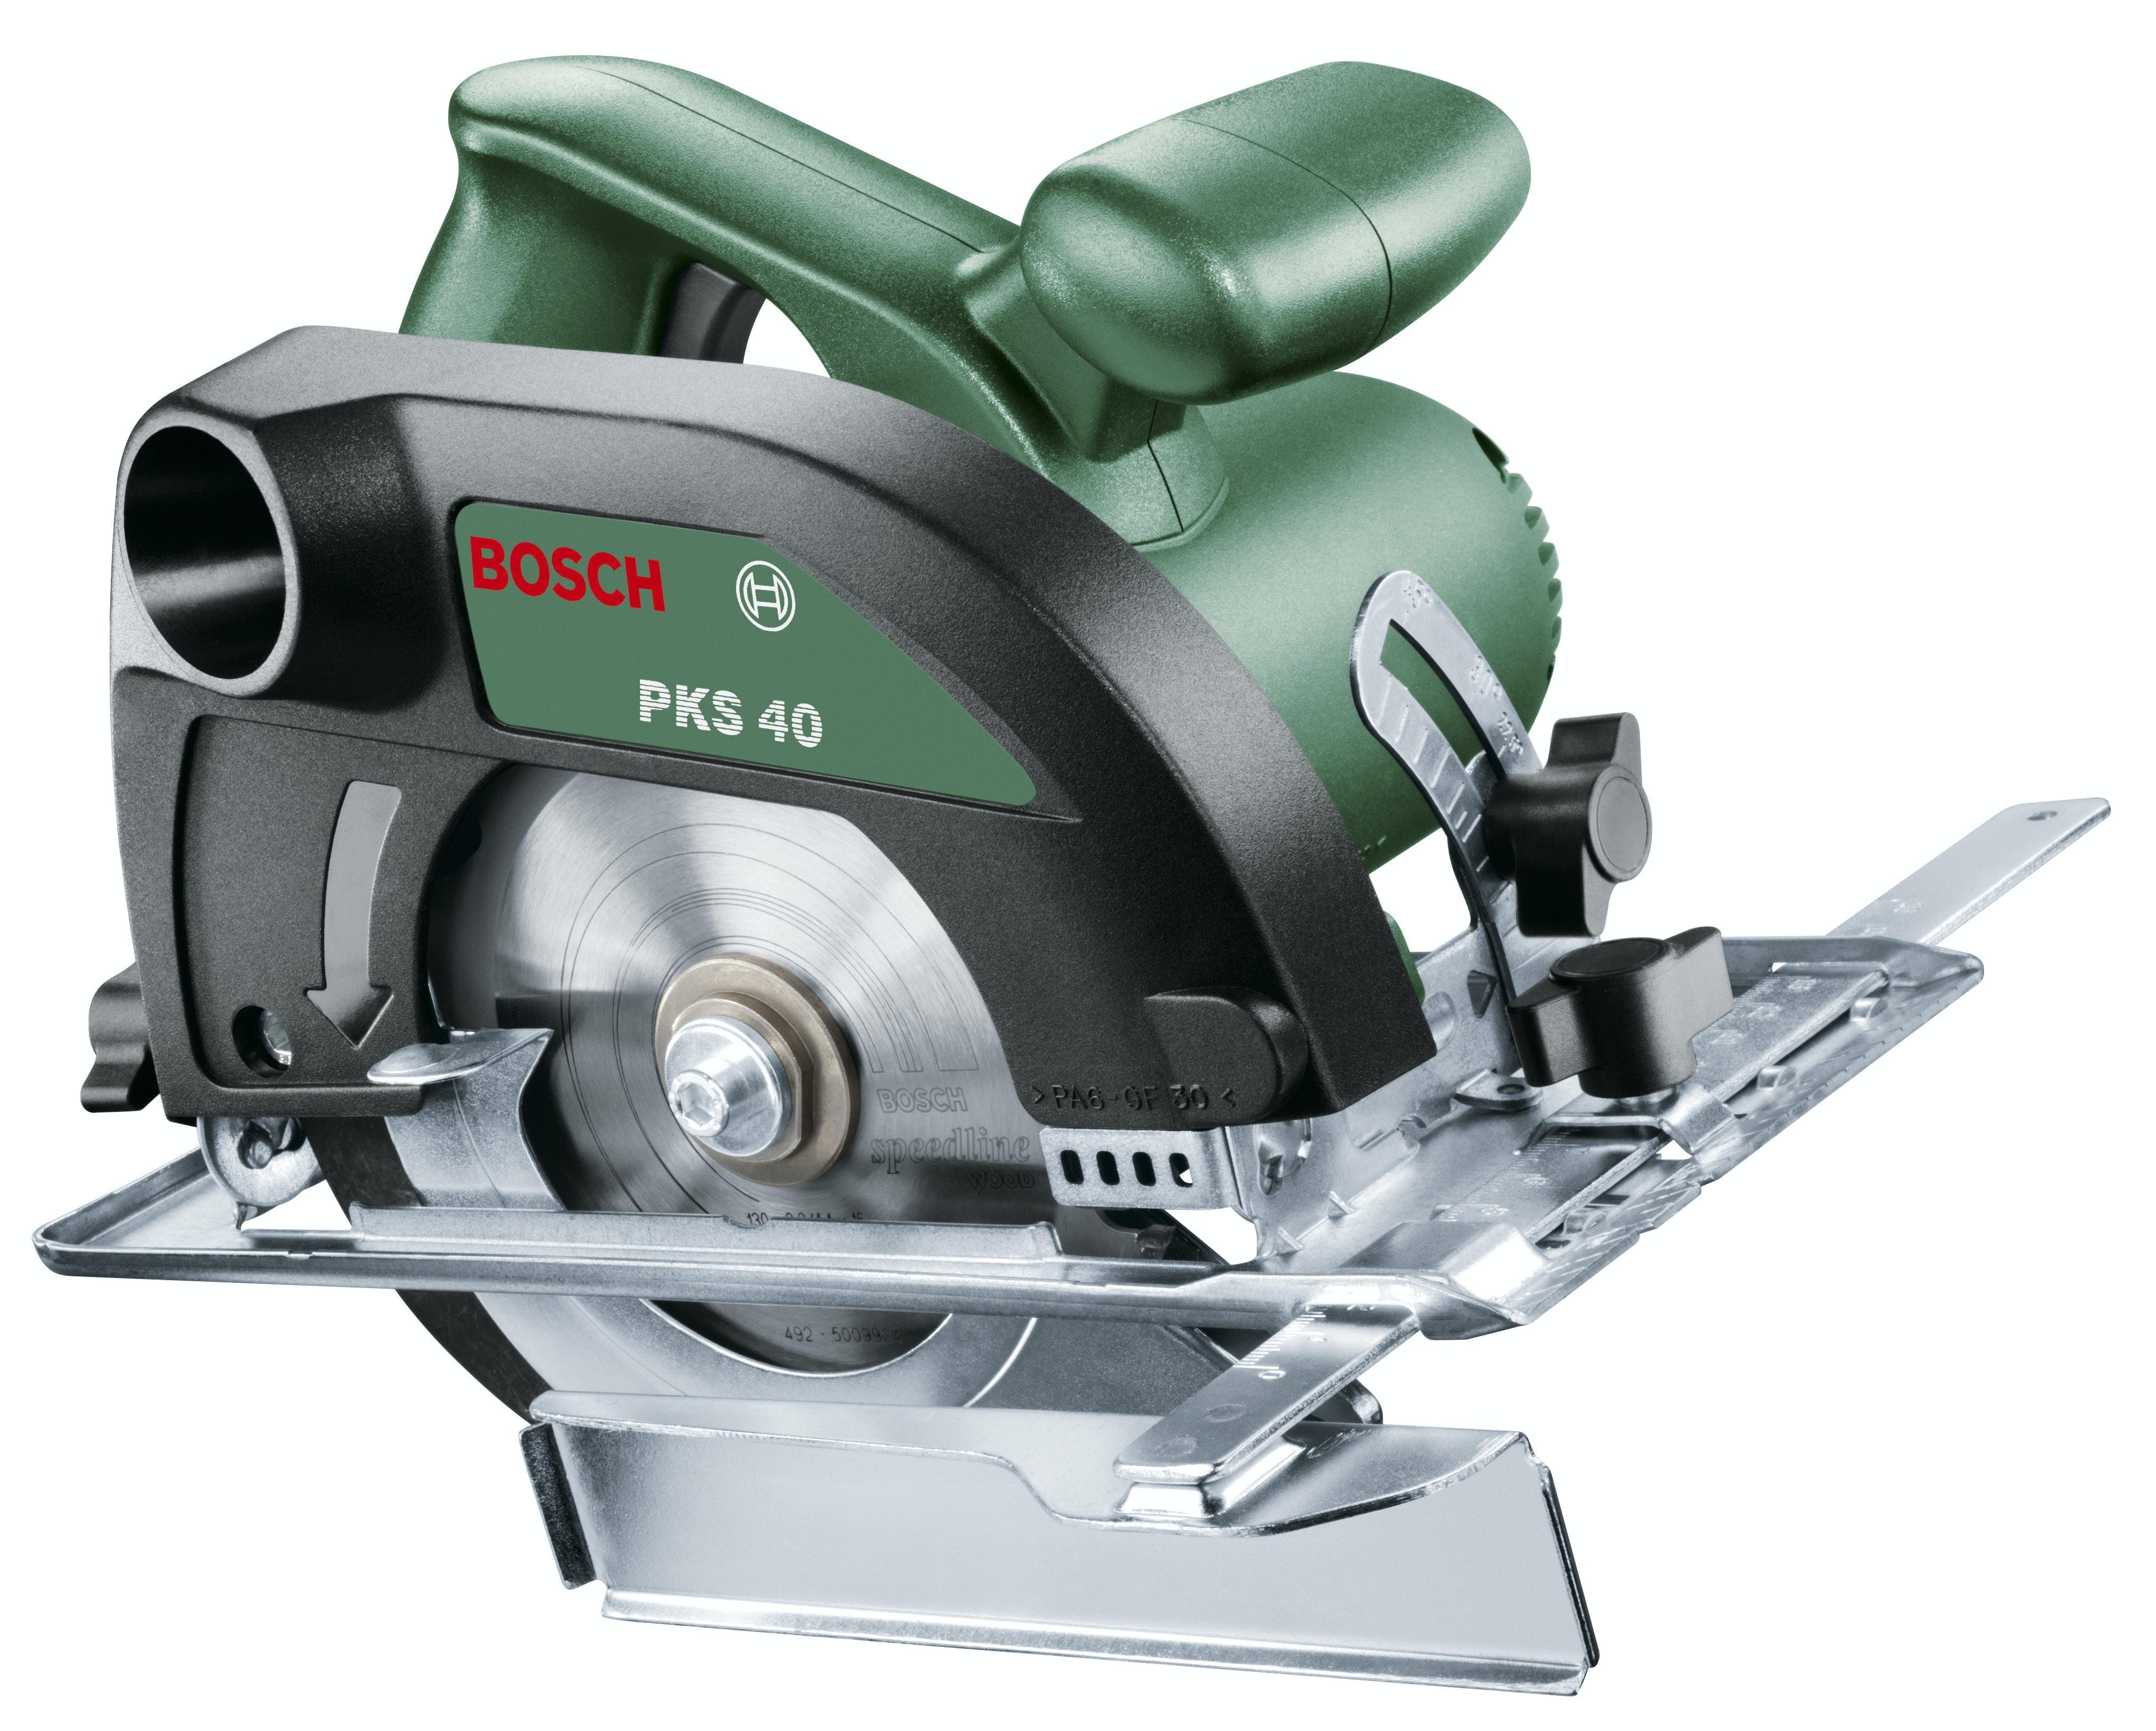 Cirkelsåg Bosch PKS40 600W